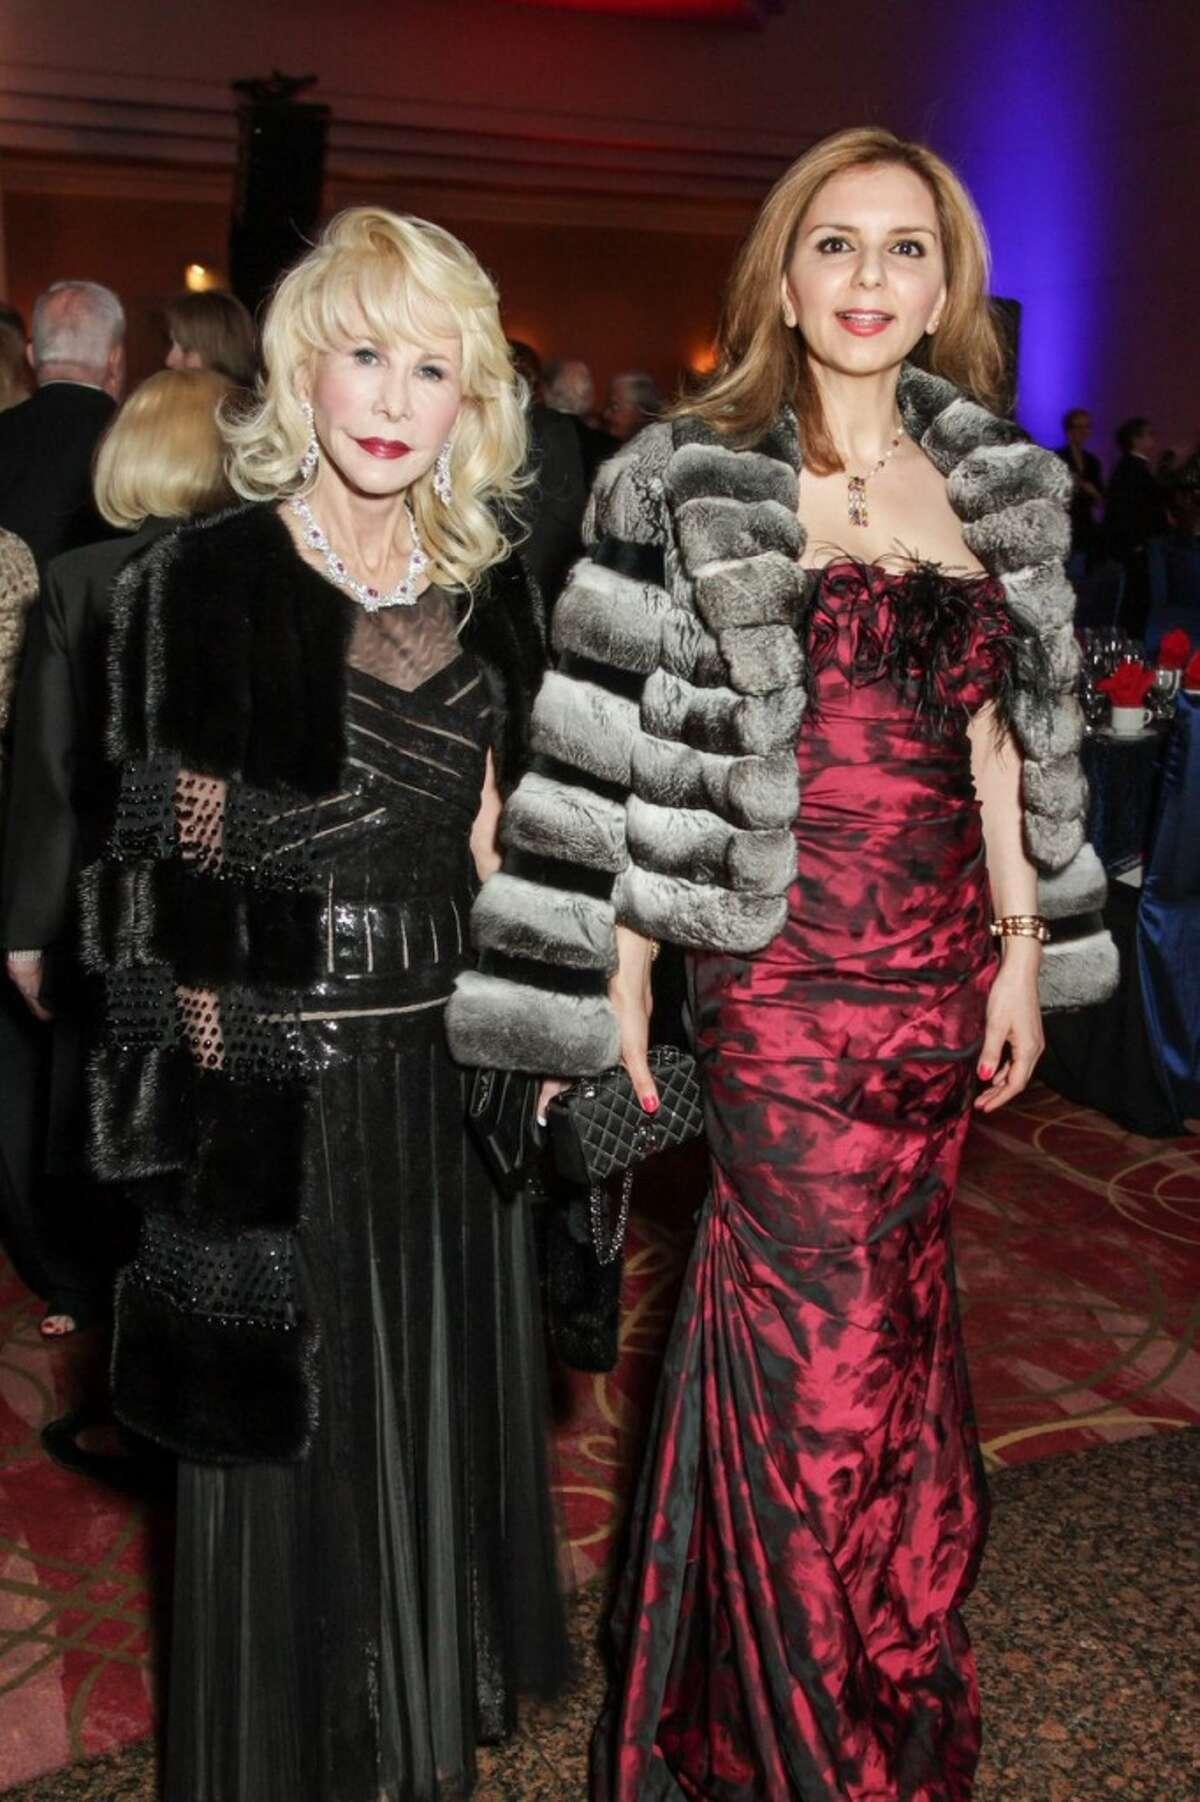 Diane Lokey Farb and Sallymoon Benz